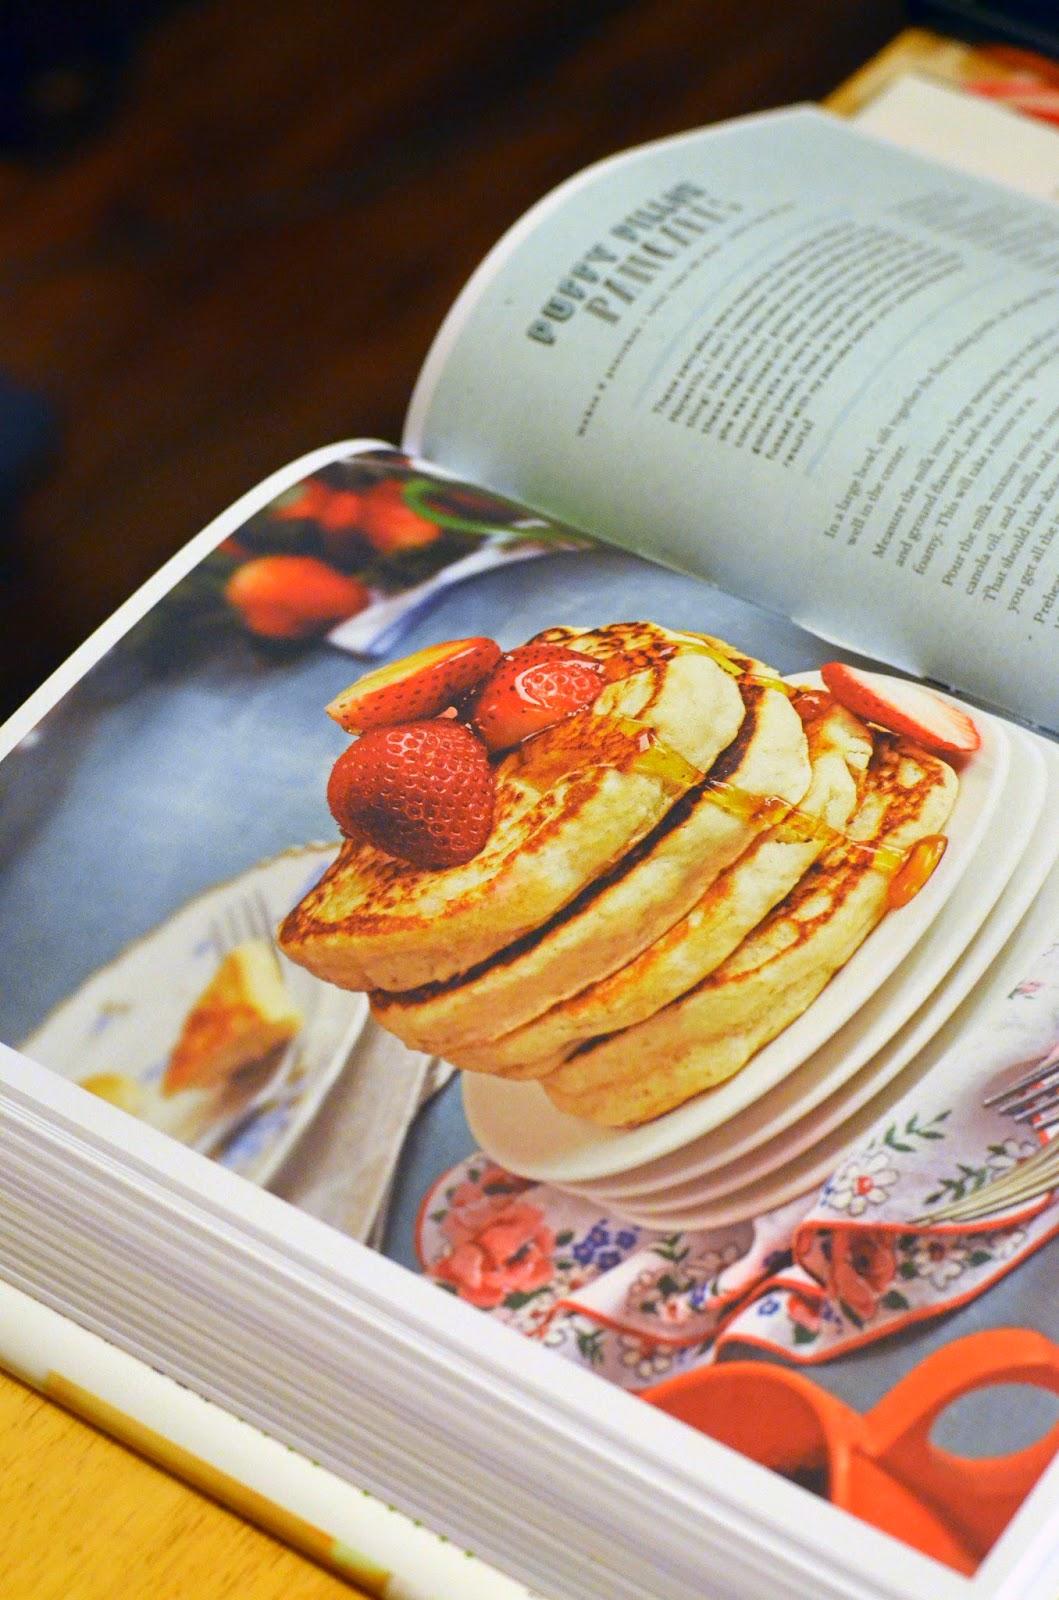 vanishing veggie cookbook creations pillow pancakes